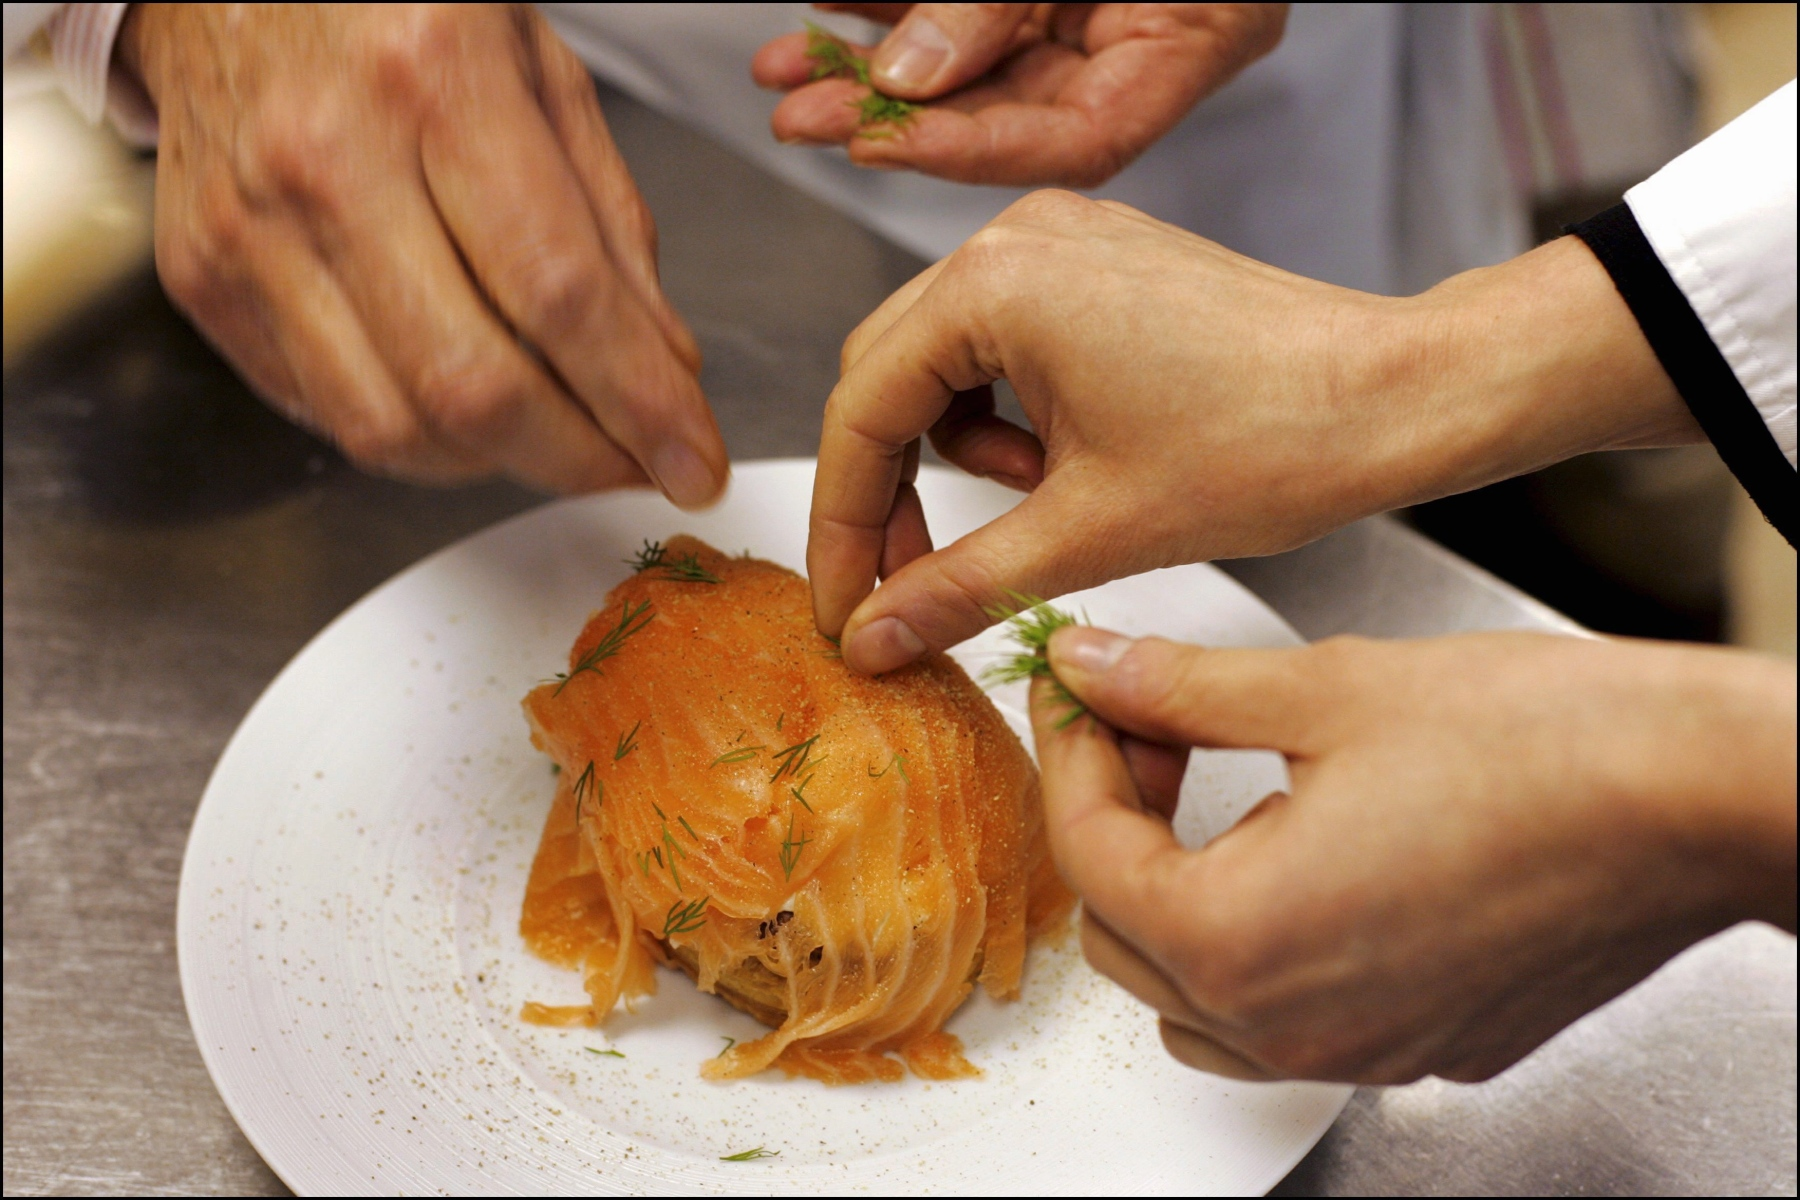 chefs in Paris making food yum